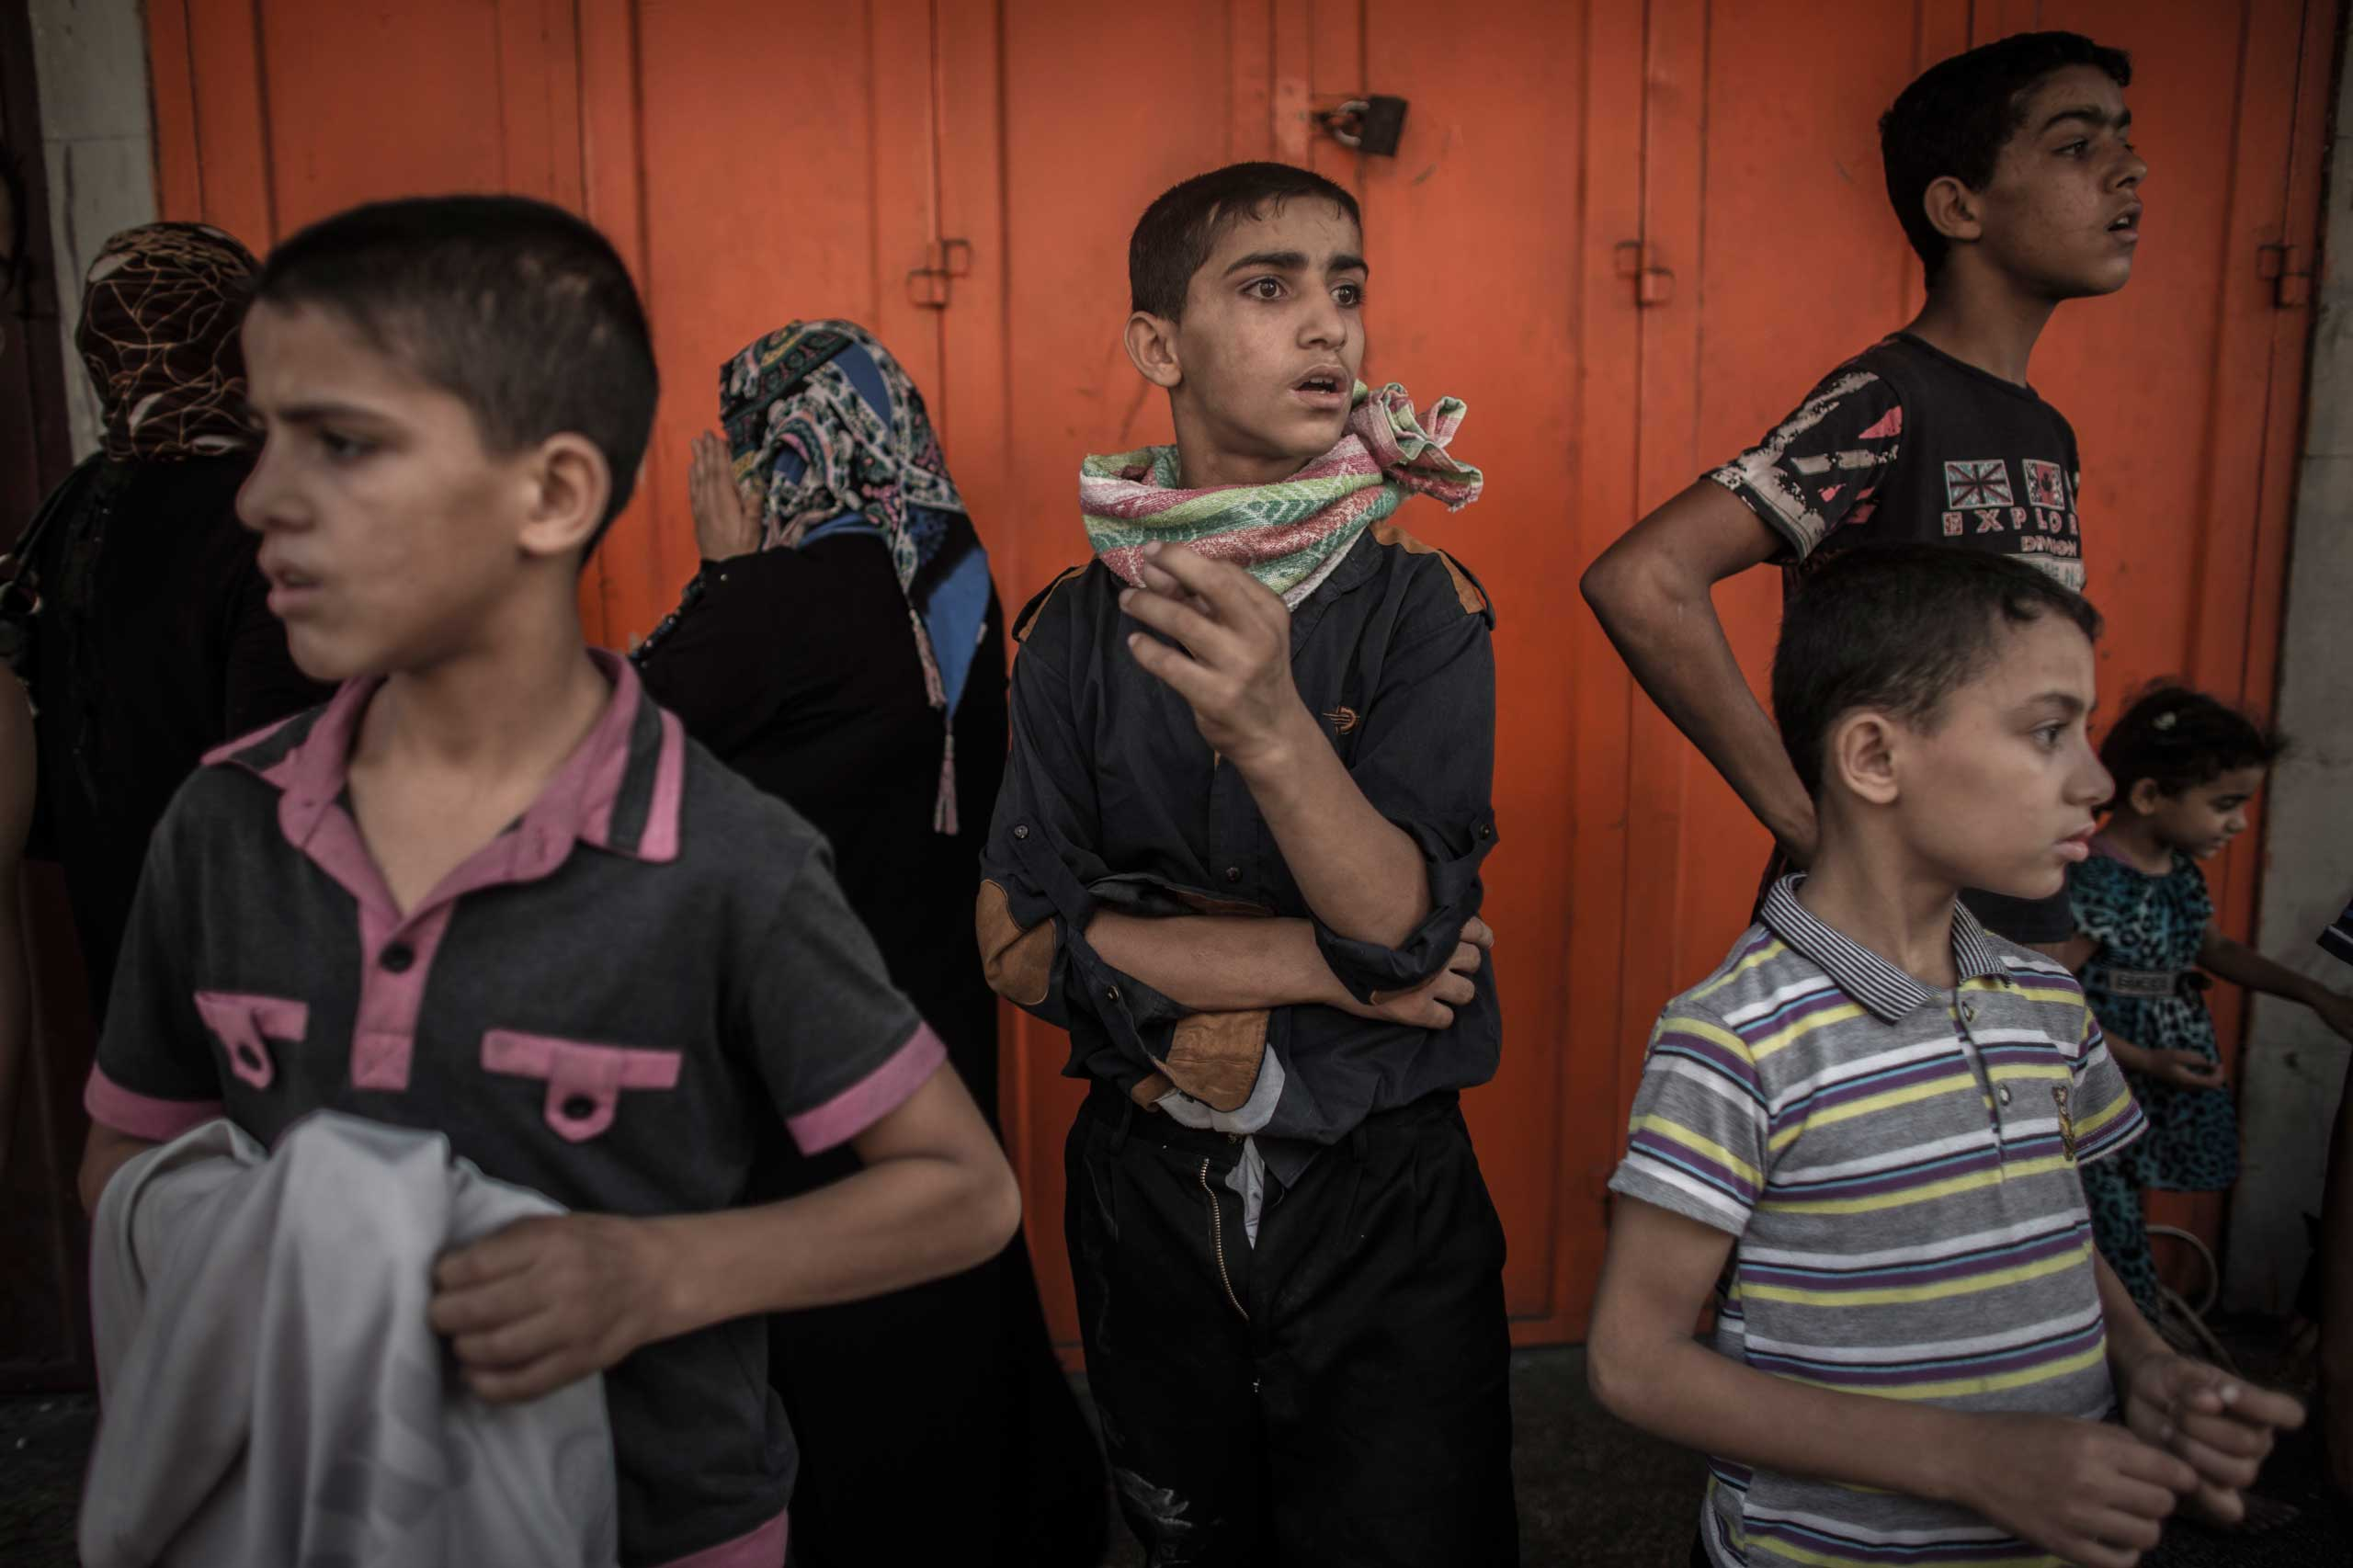 Palestinians boys watch people fleeing from the neighborhood of Shejaiya, in east Gaza City, July 20, 2014.